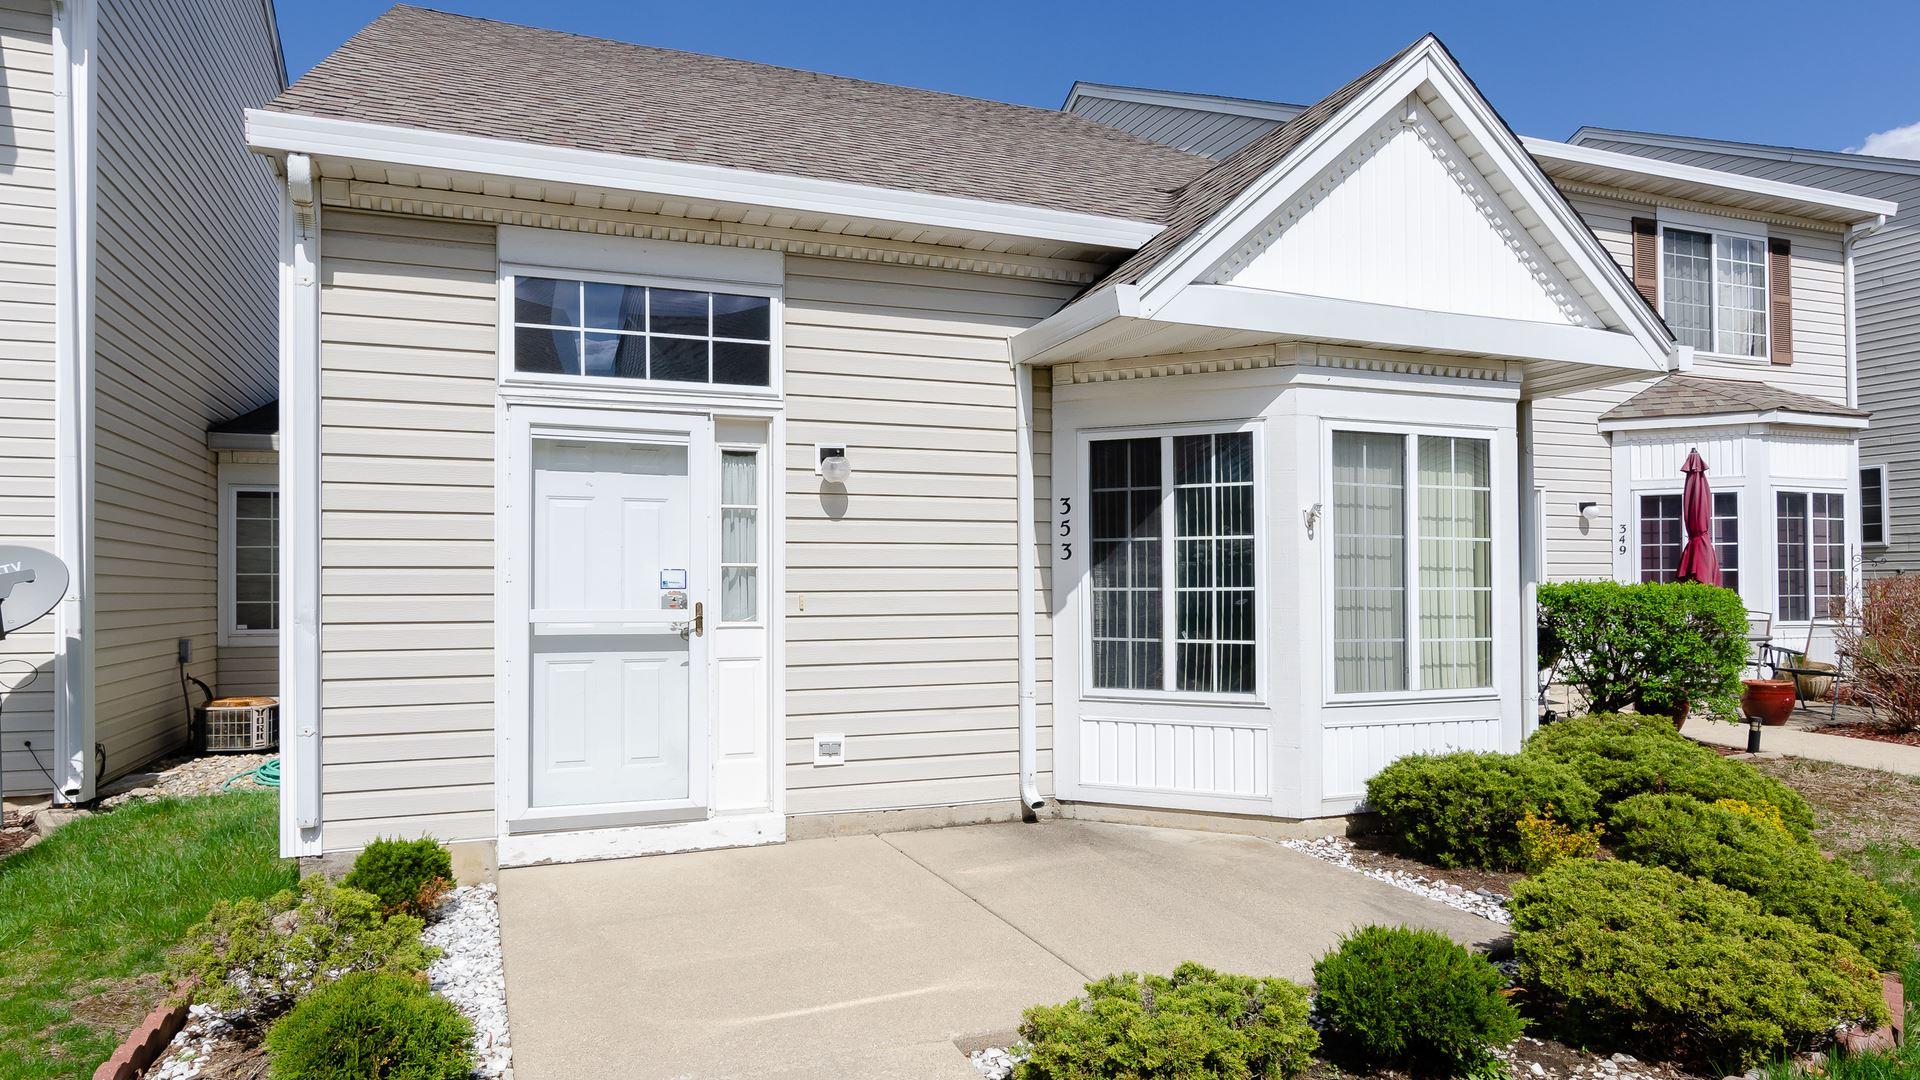 Photo of 353 Magnolia Court, Bolingbrook, IL 60440 (MLS # 11060619)